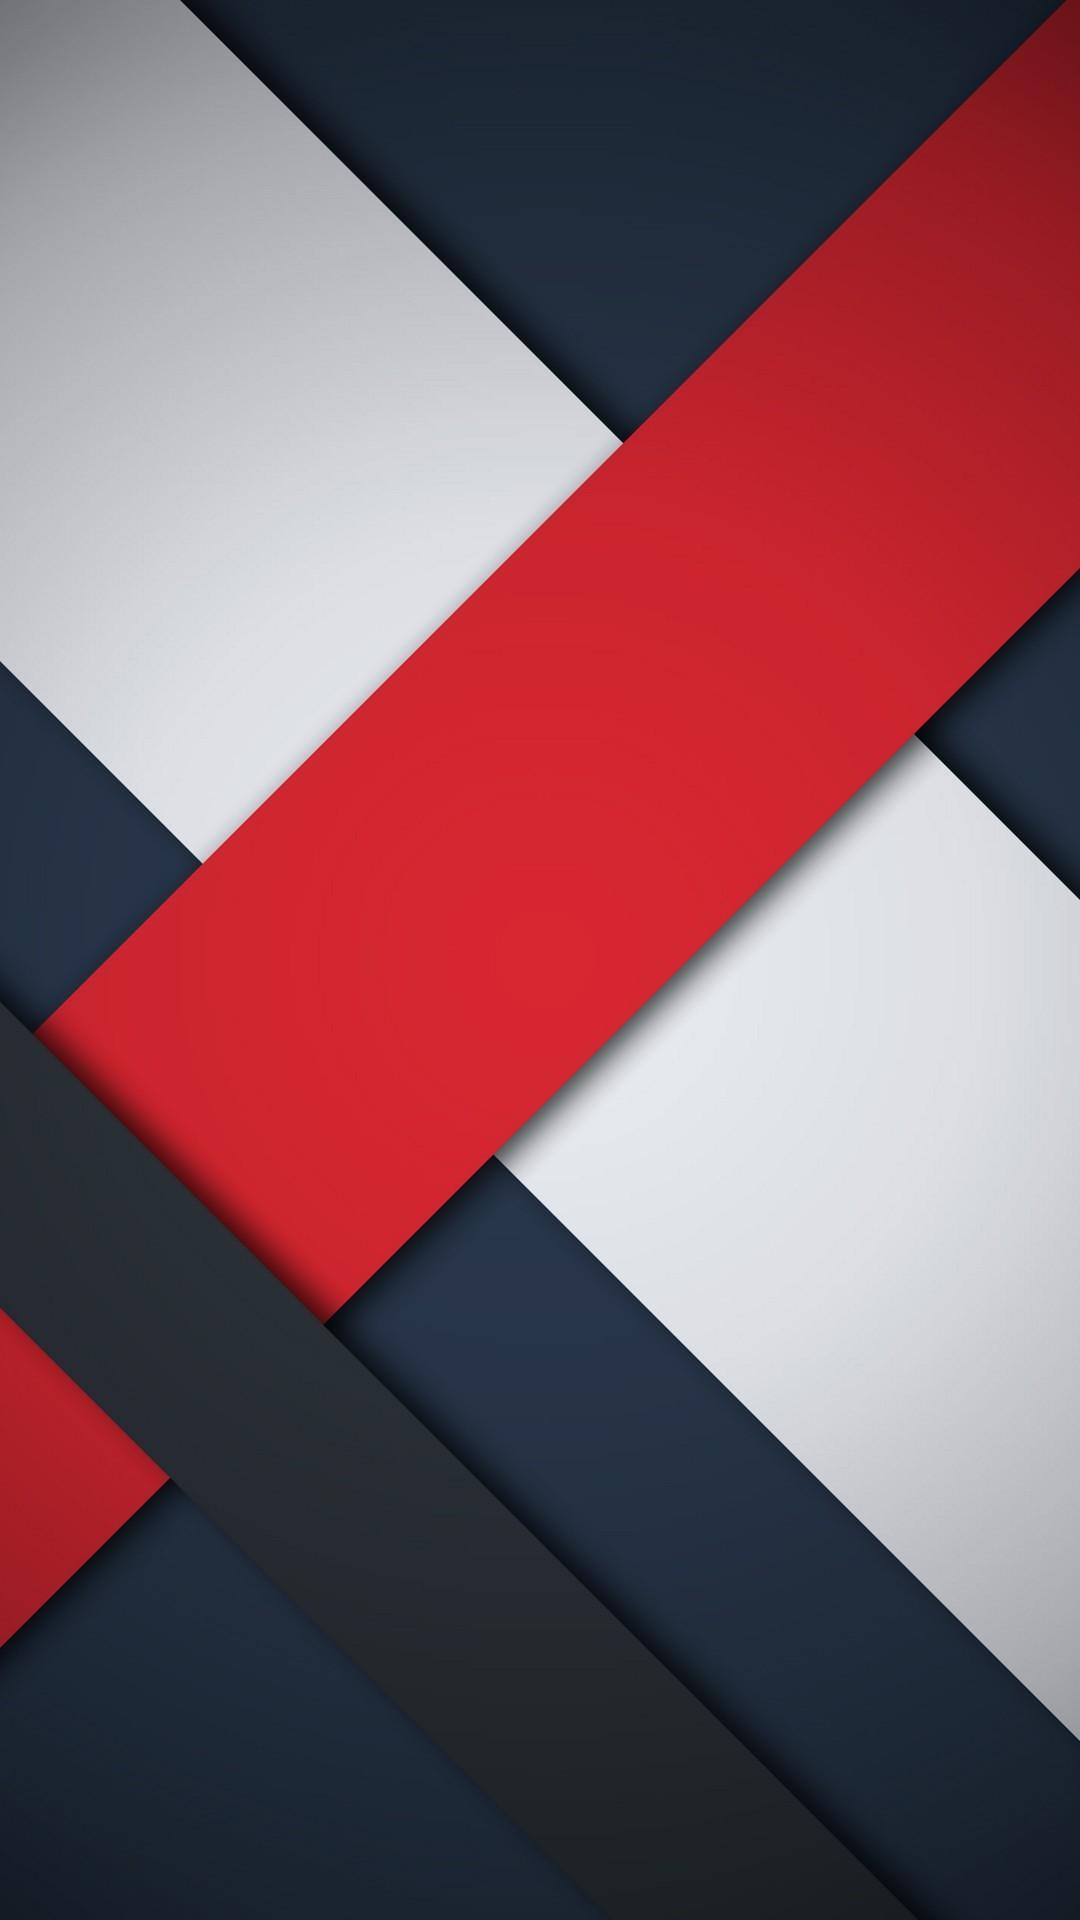 Designer hd wallpaper for iphone